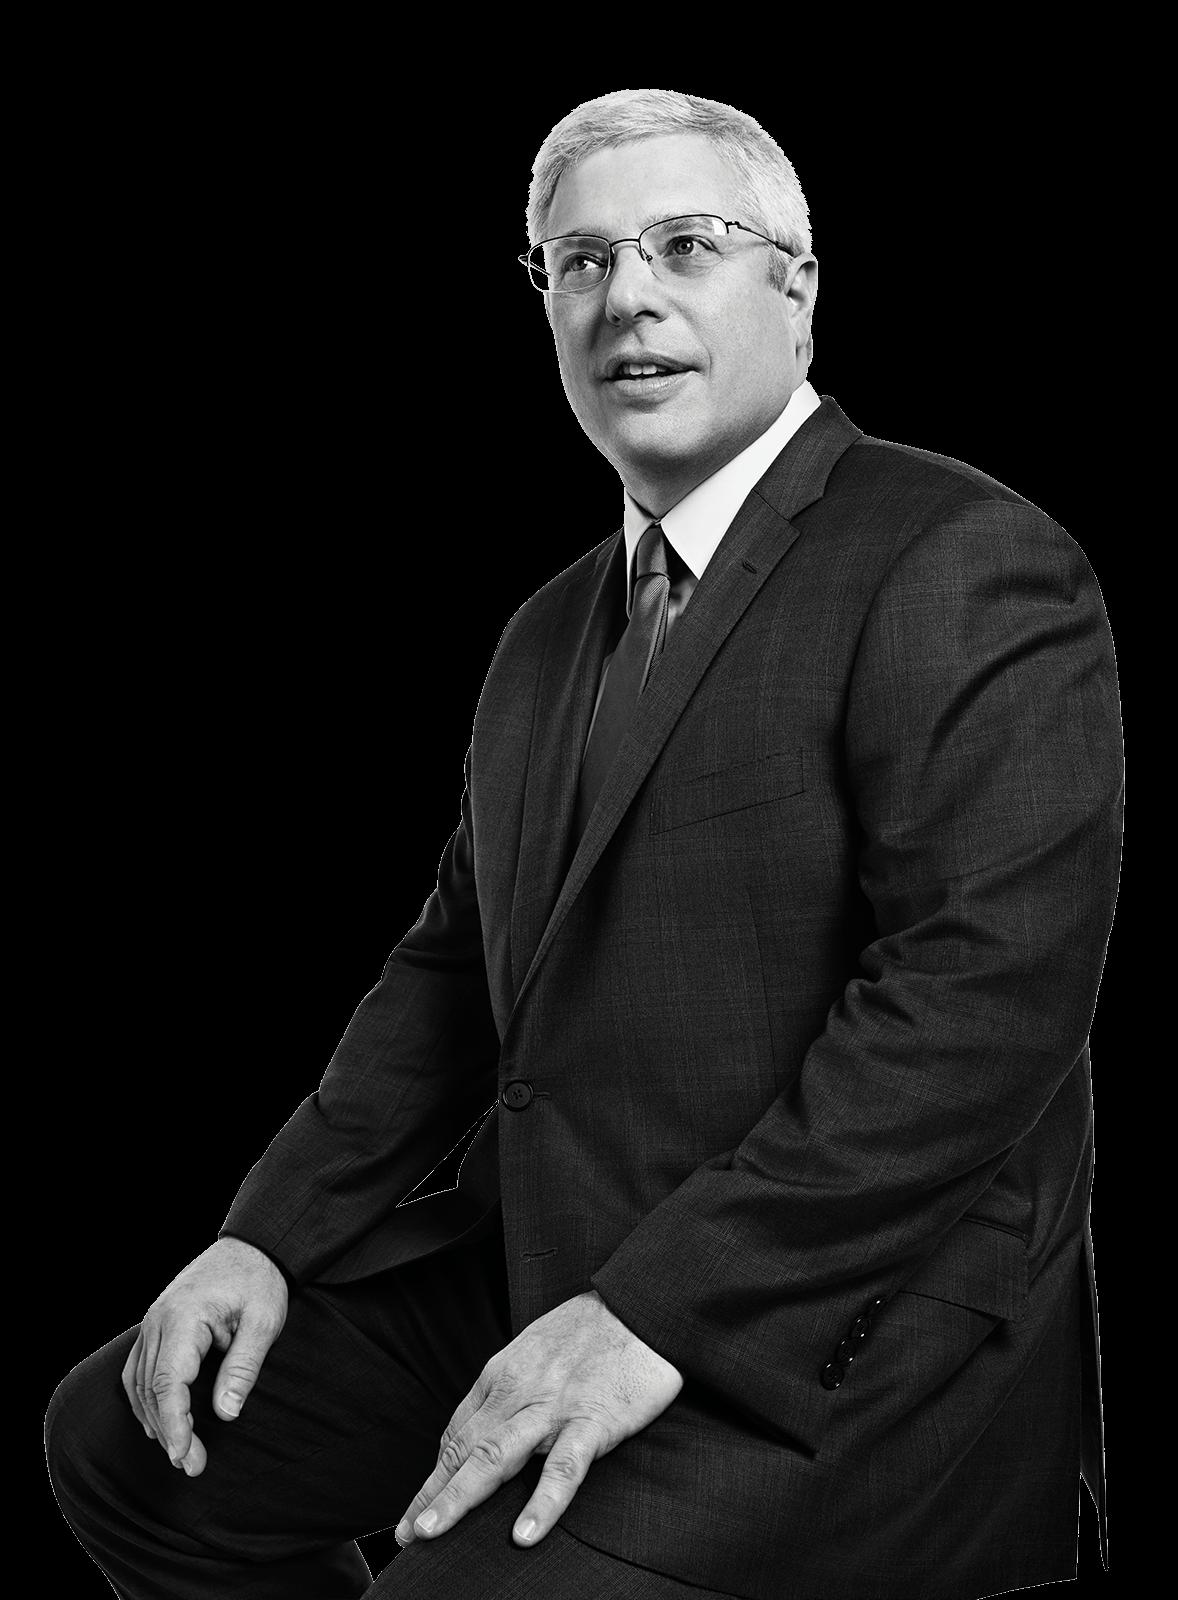 Photograph of Michael Alexander